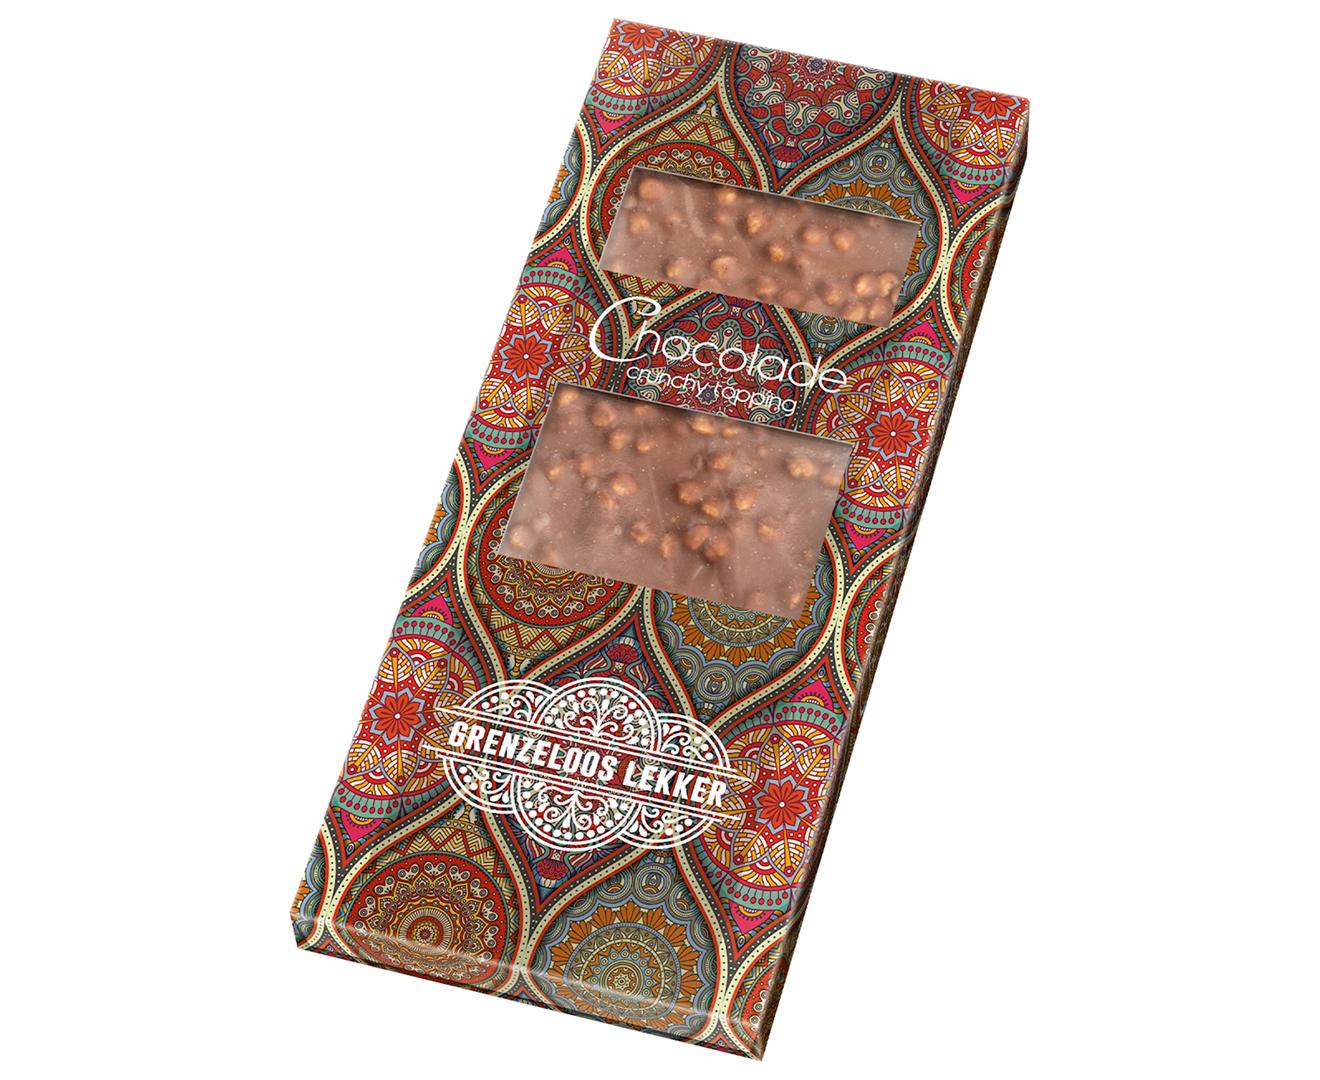 Productafbeelding Chocoladereep Grenzeloos lekker 80g doos